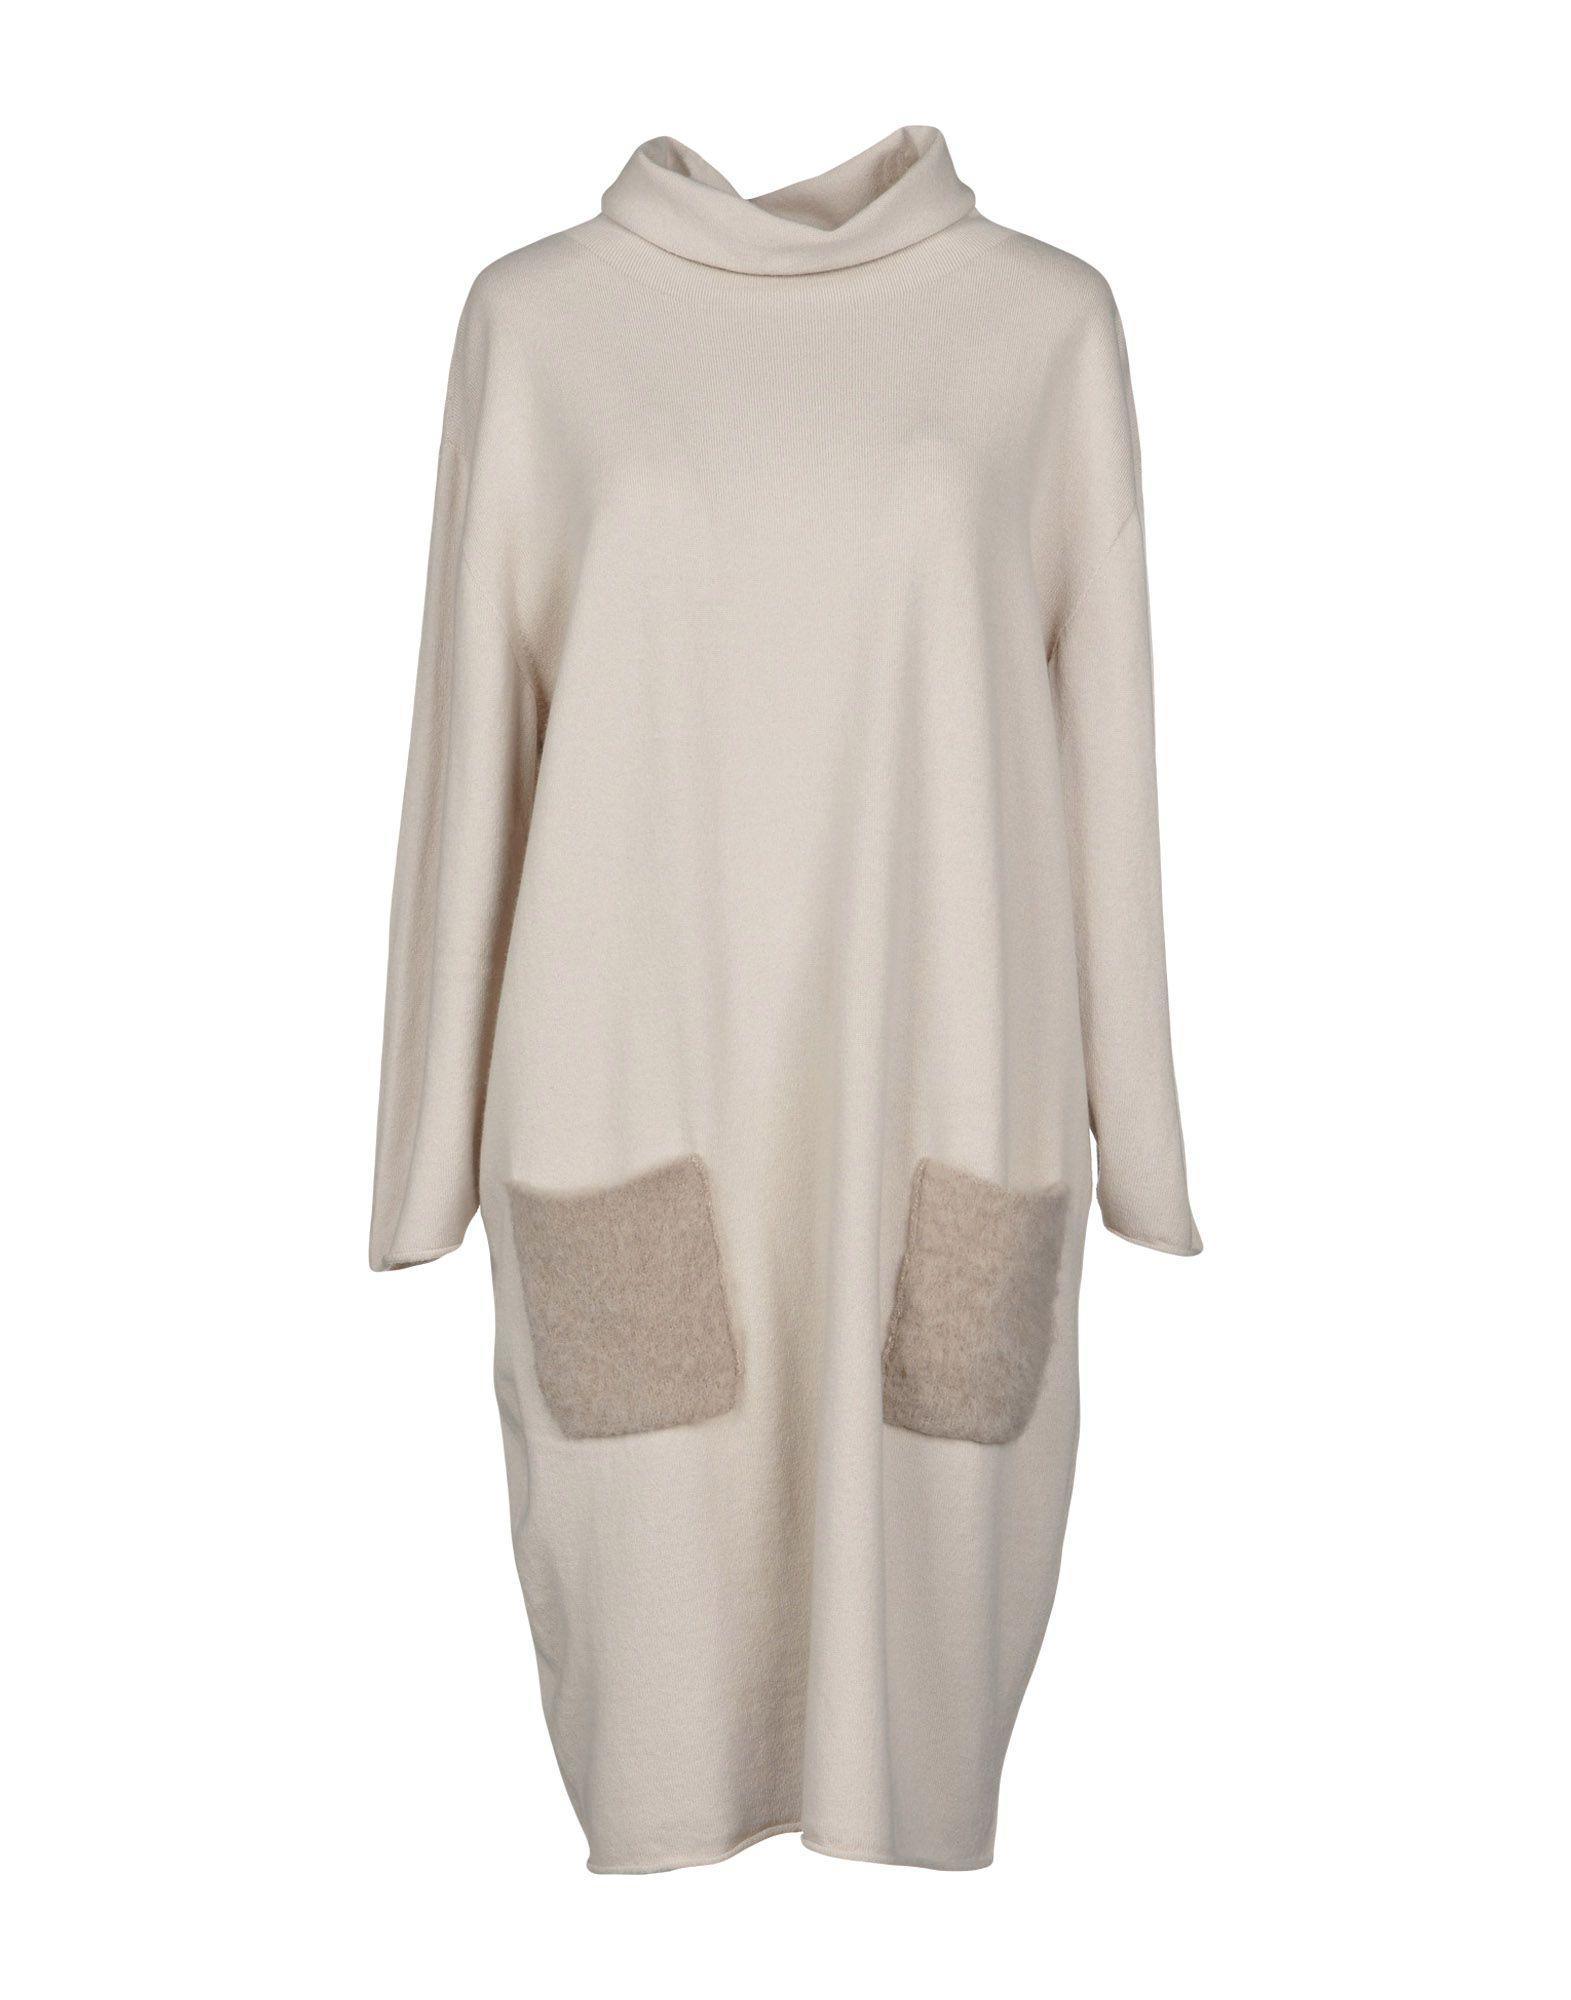 Lamberto Losani Short Dress In Beige